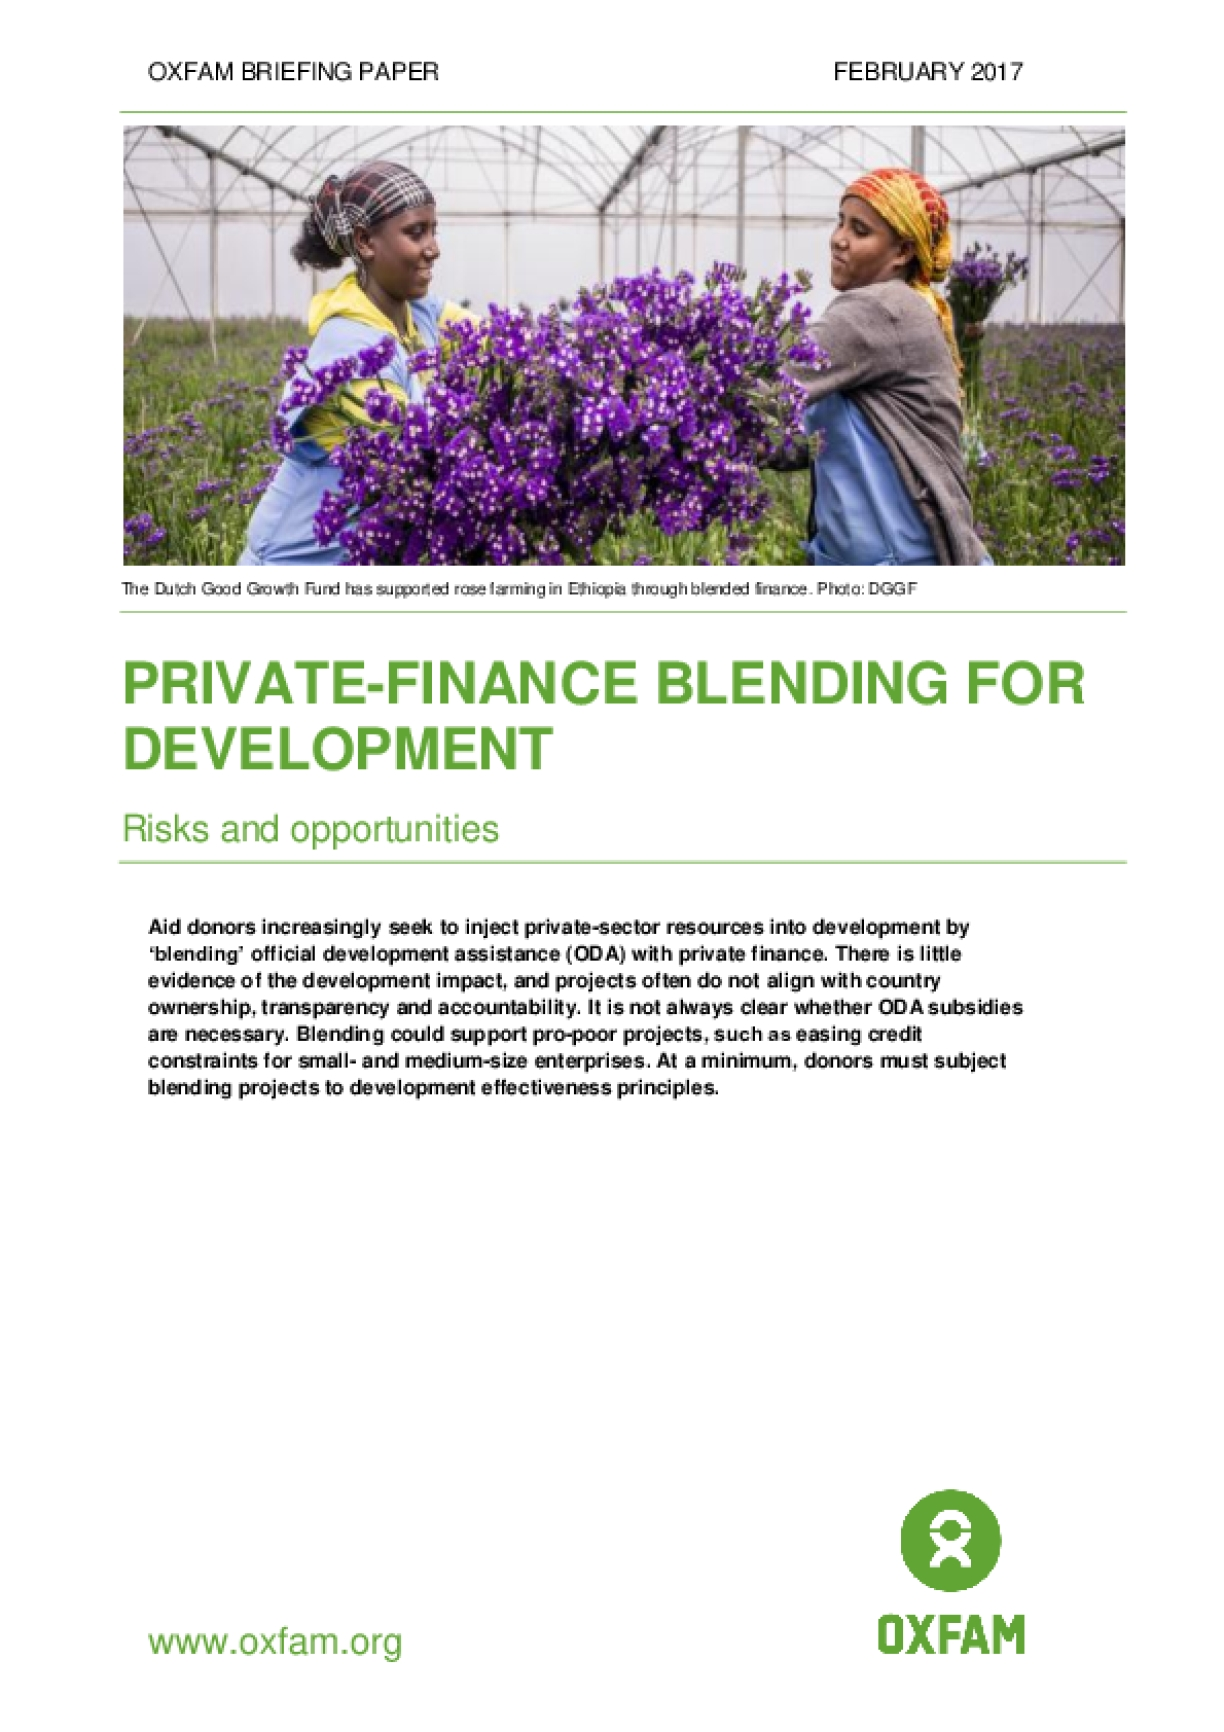 Private-finance Blending for Development: Risks and Opportunities